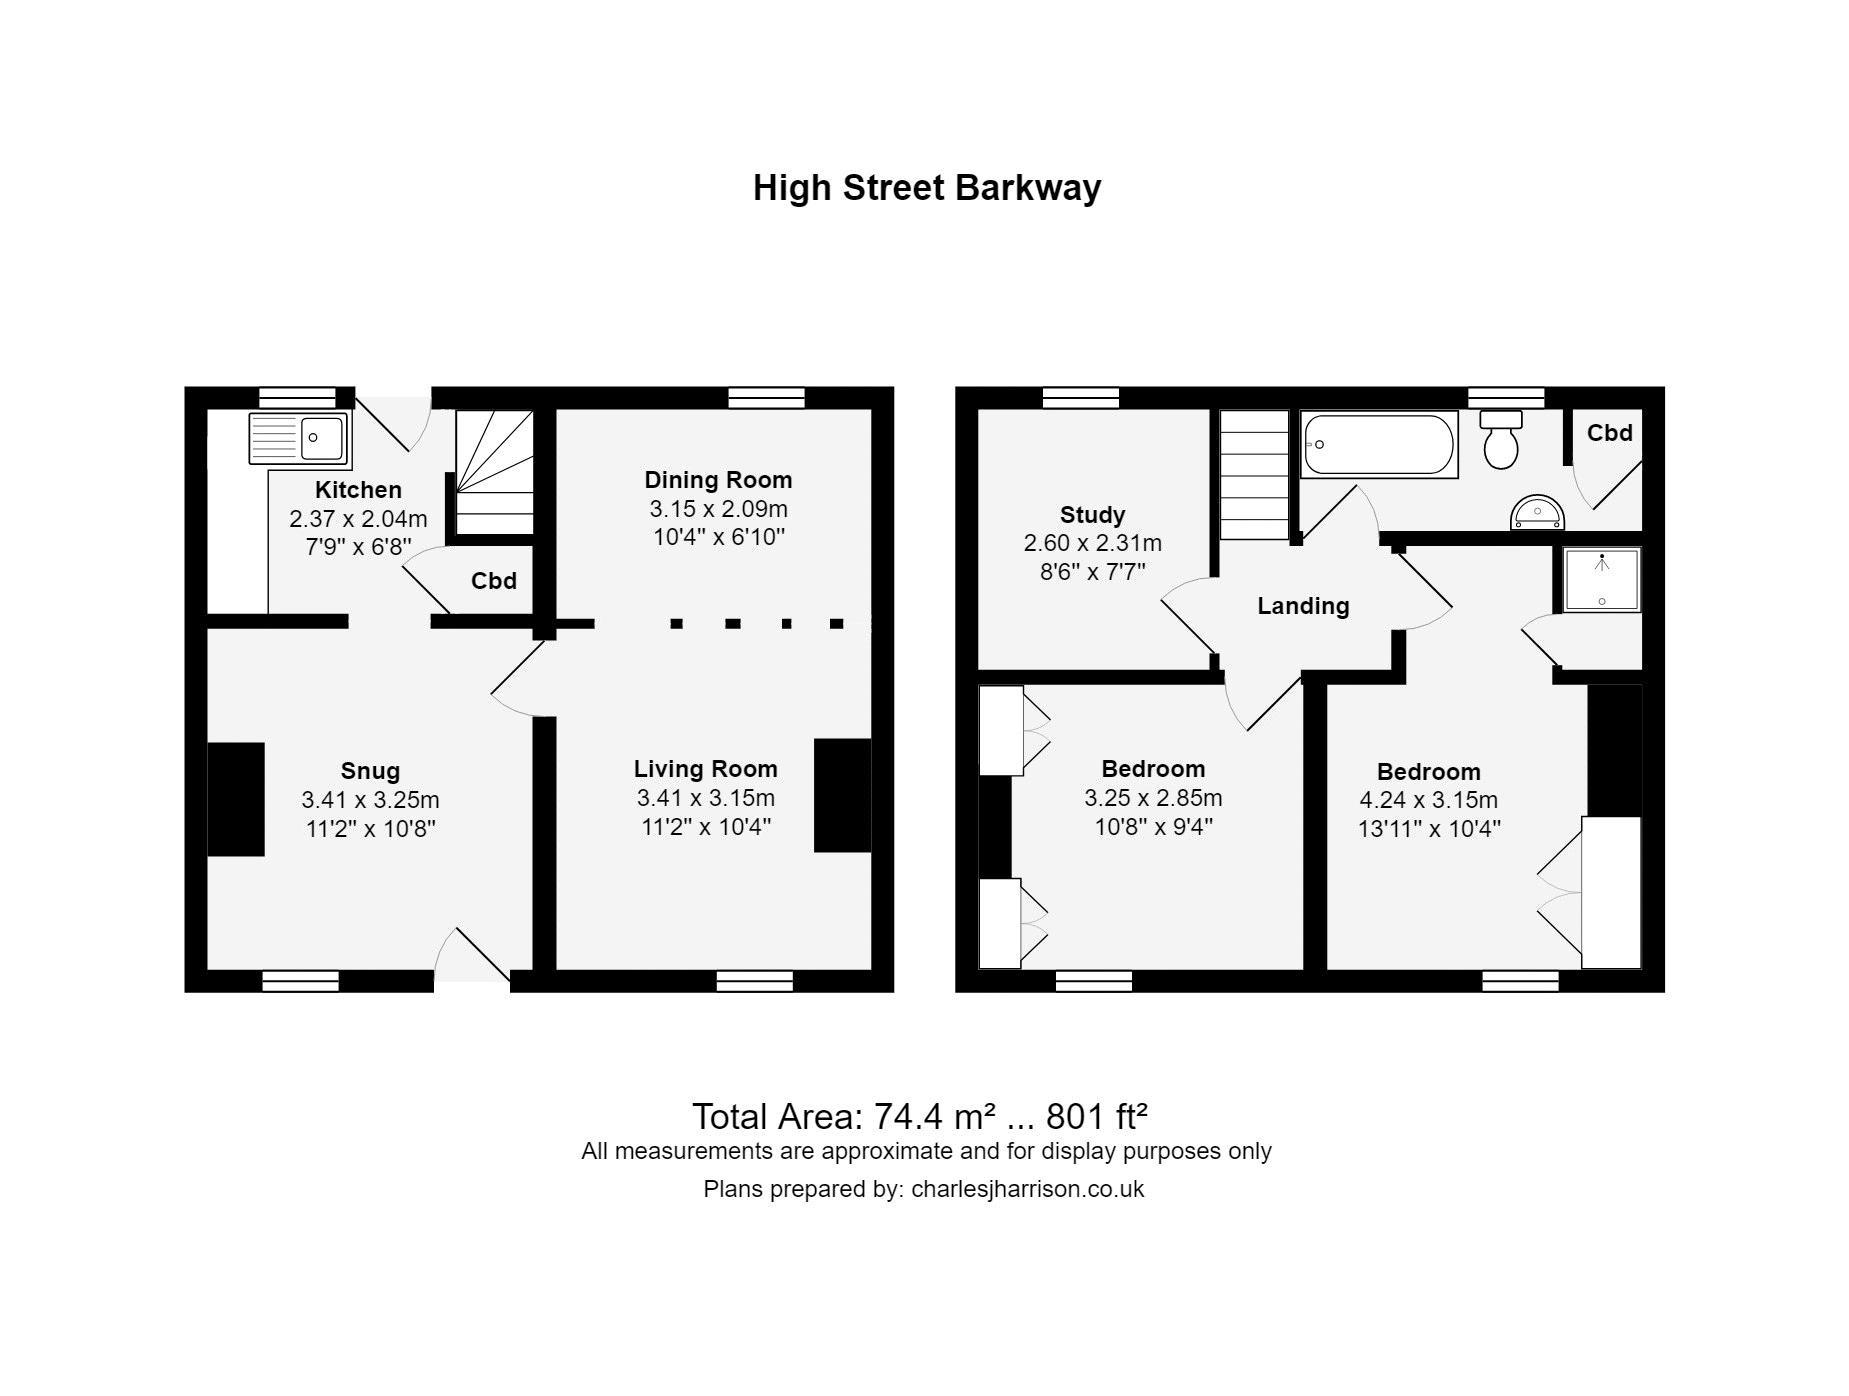 High Street Barkway